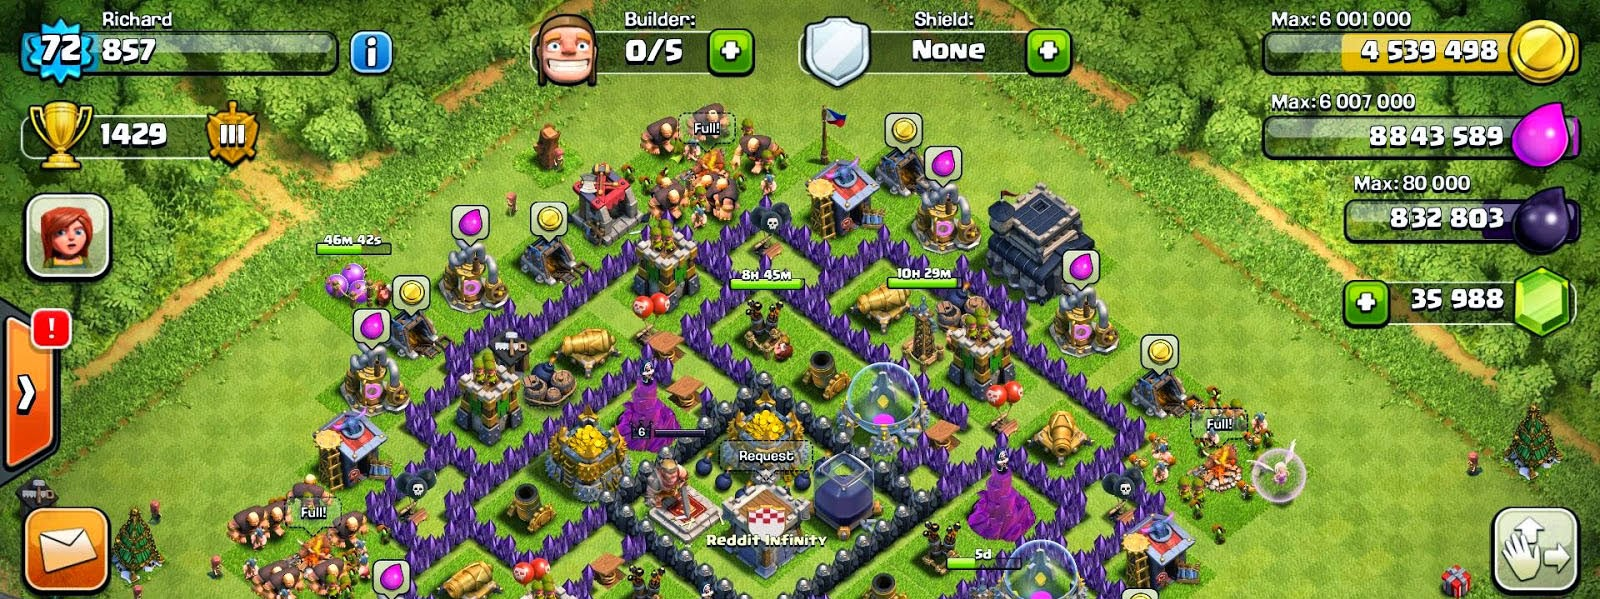 clash of clans mod apk 2017 no root